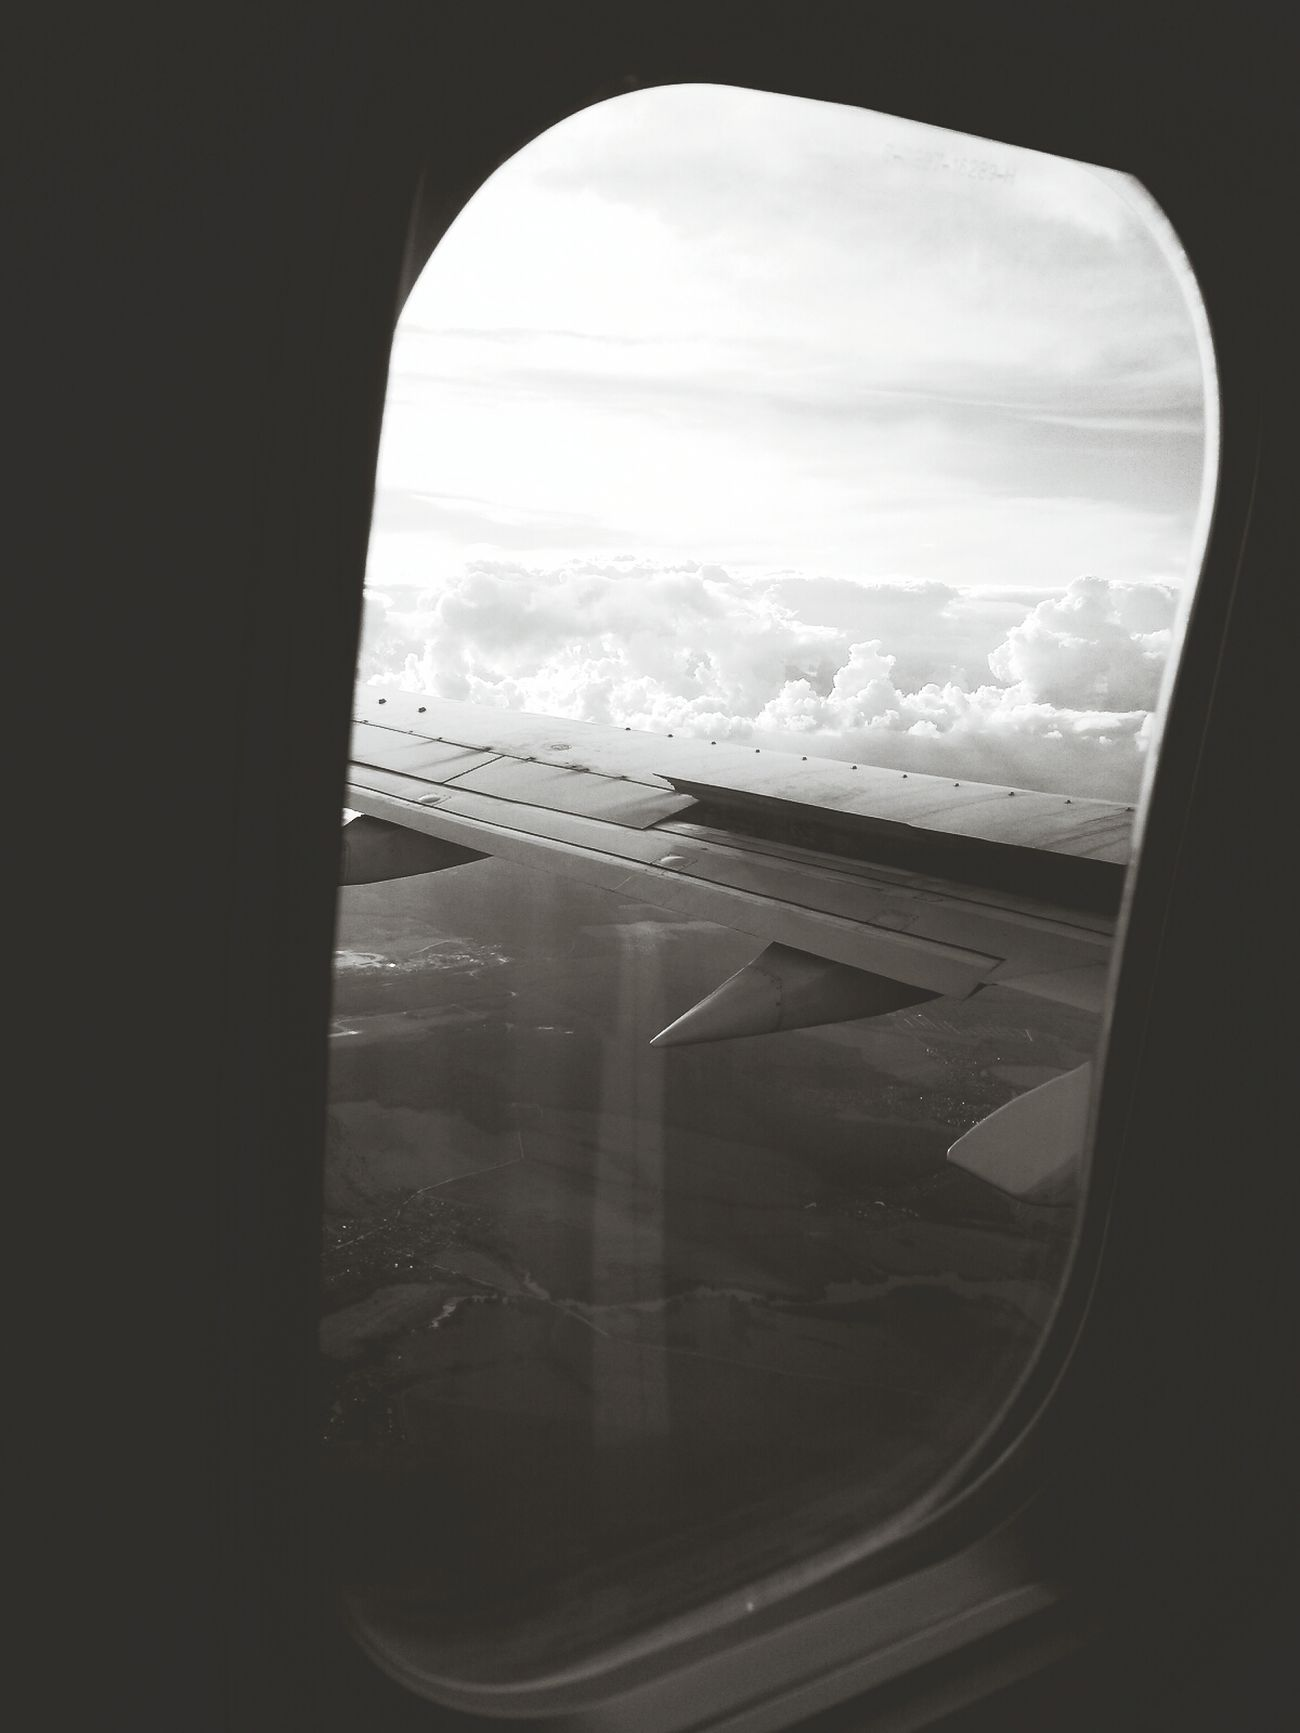 Sky Flight Clouds LongWaysFromHome